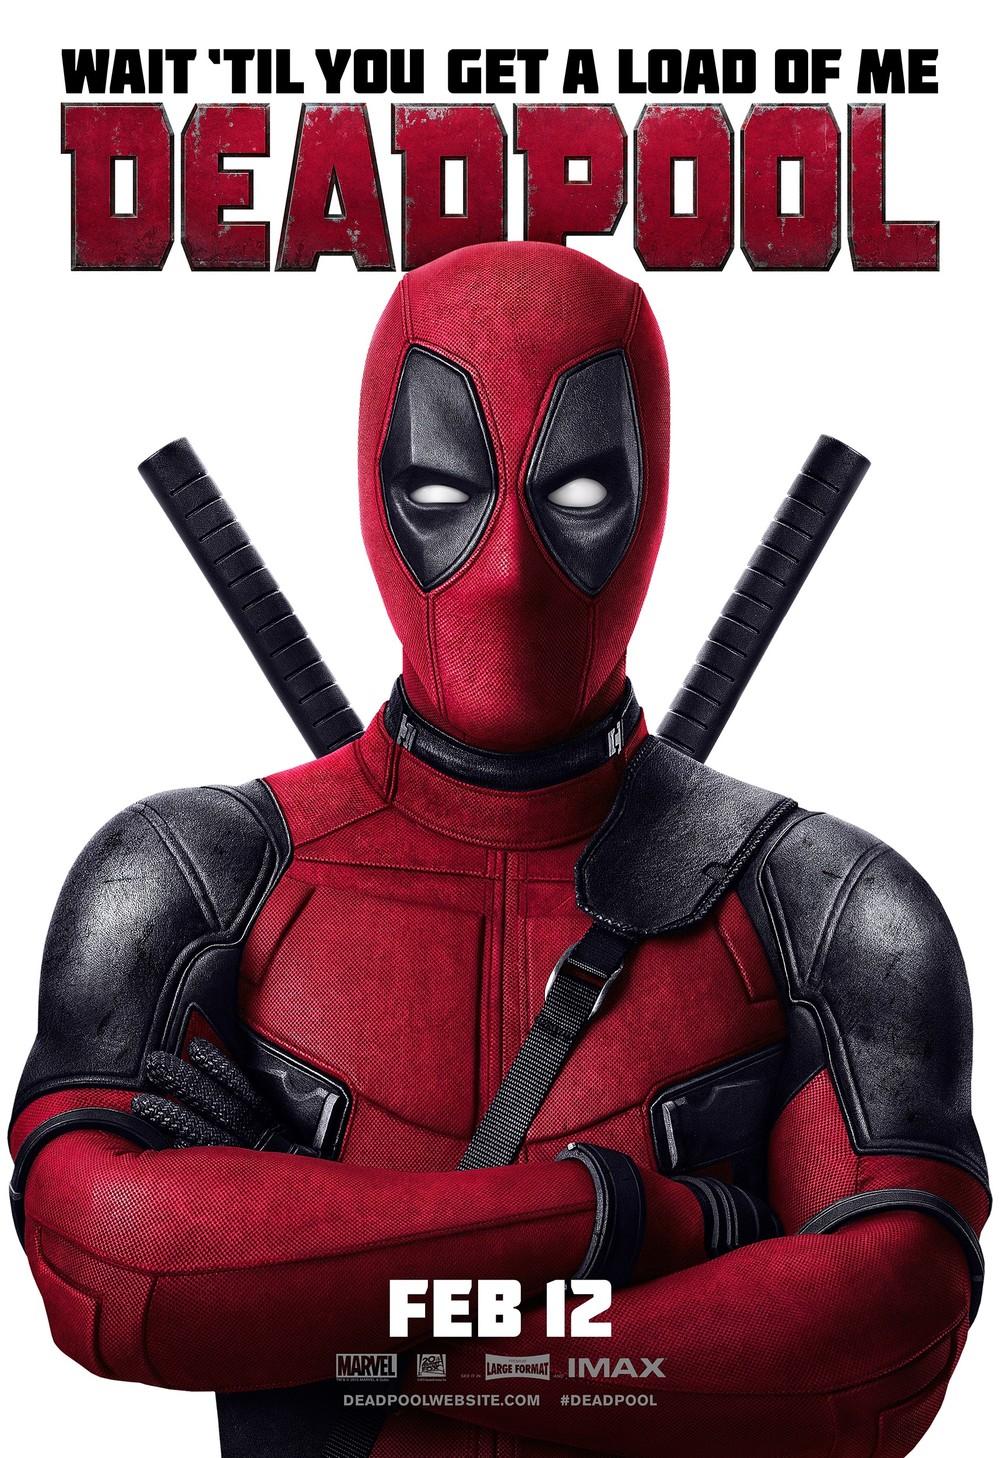 Deadpool dvd release date in Auckland